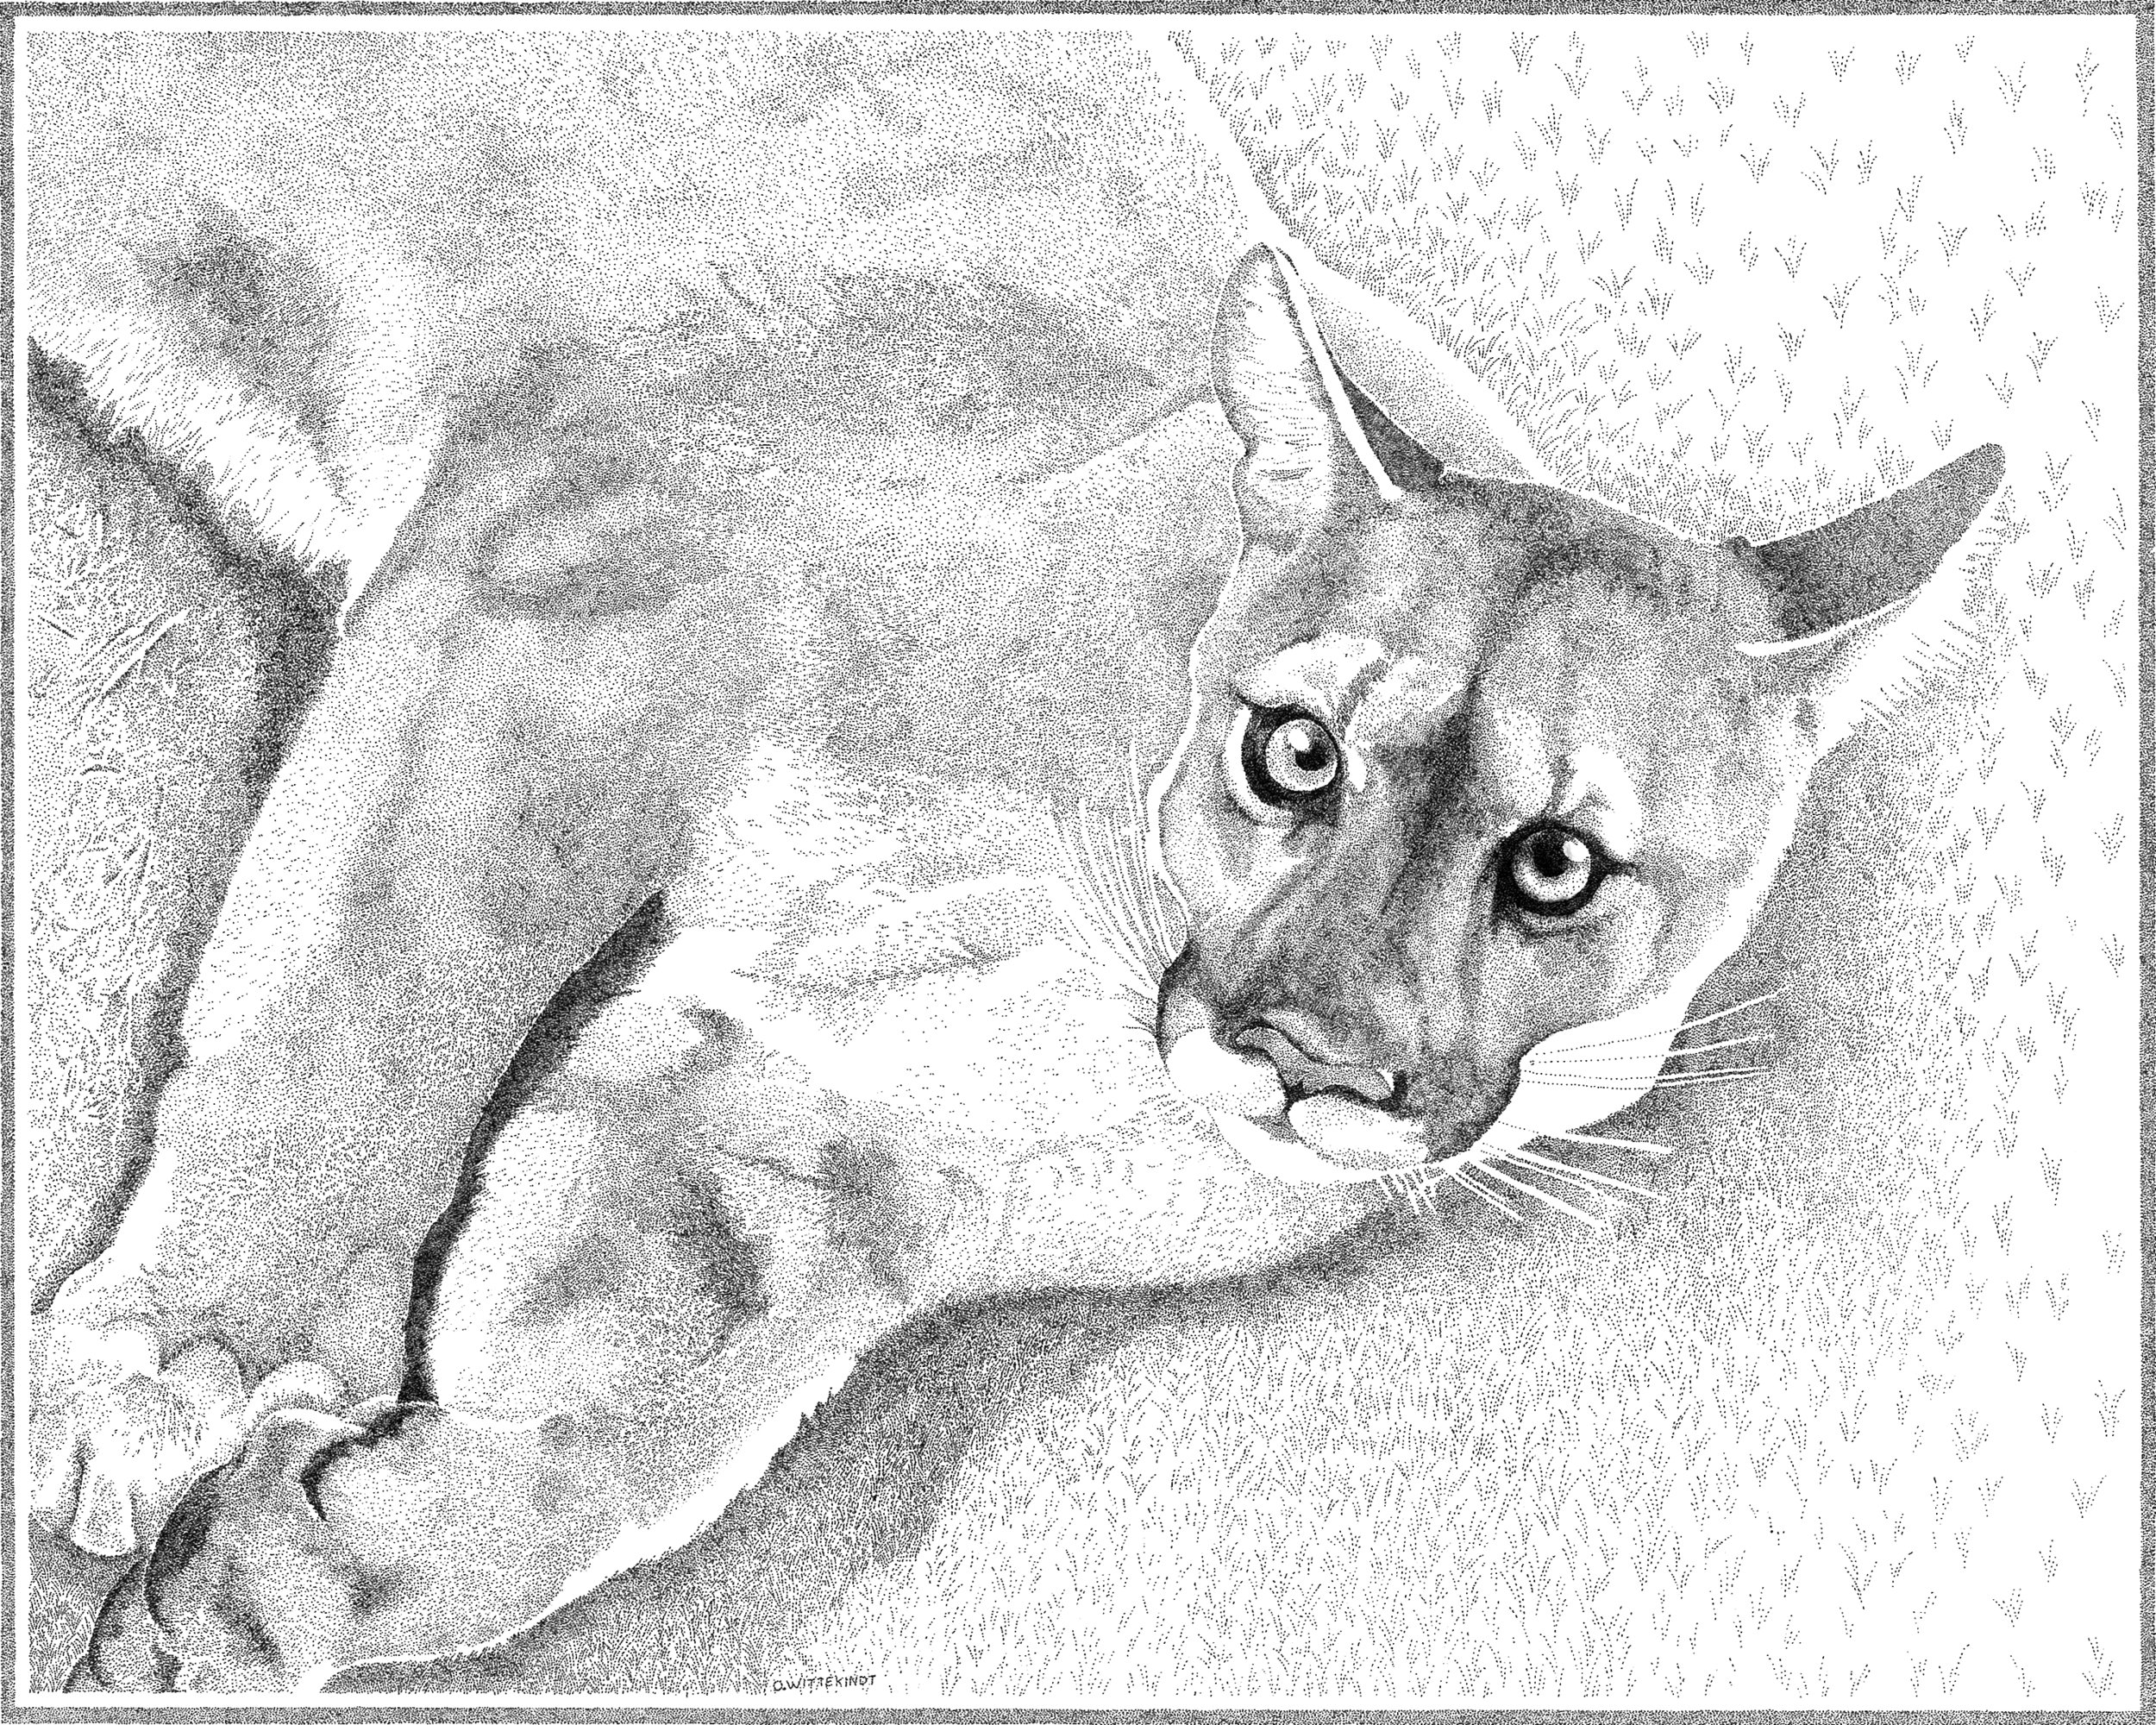 Harper the cougar